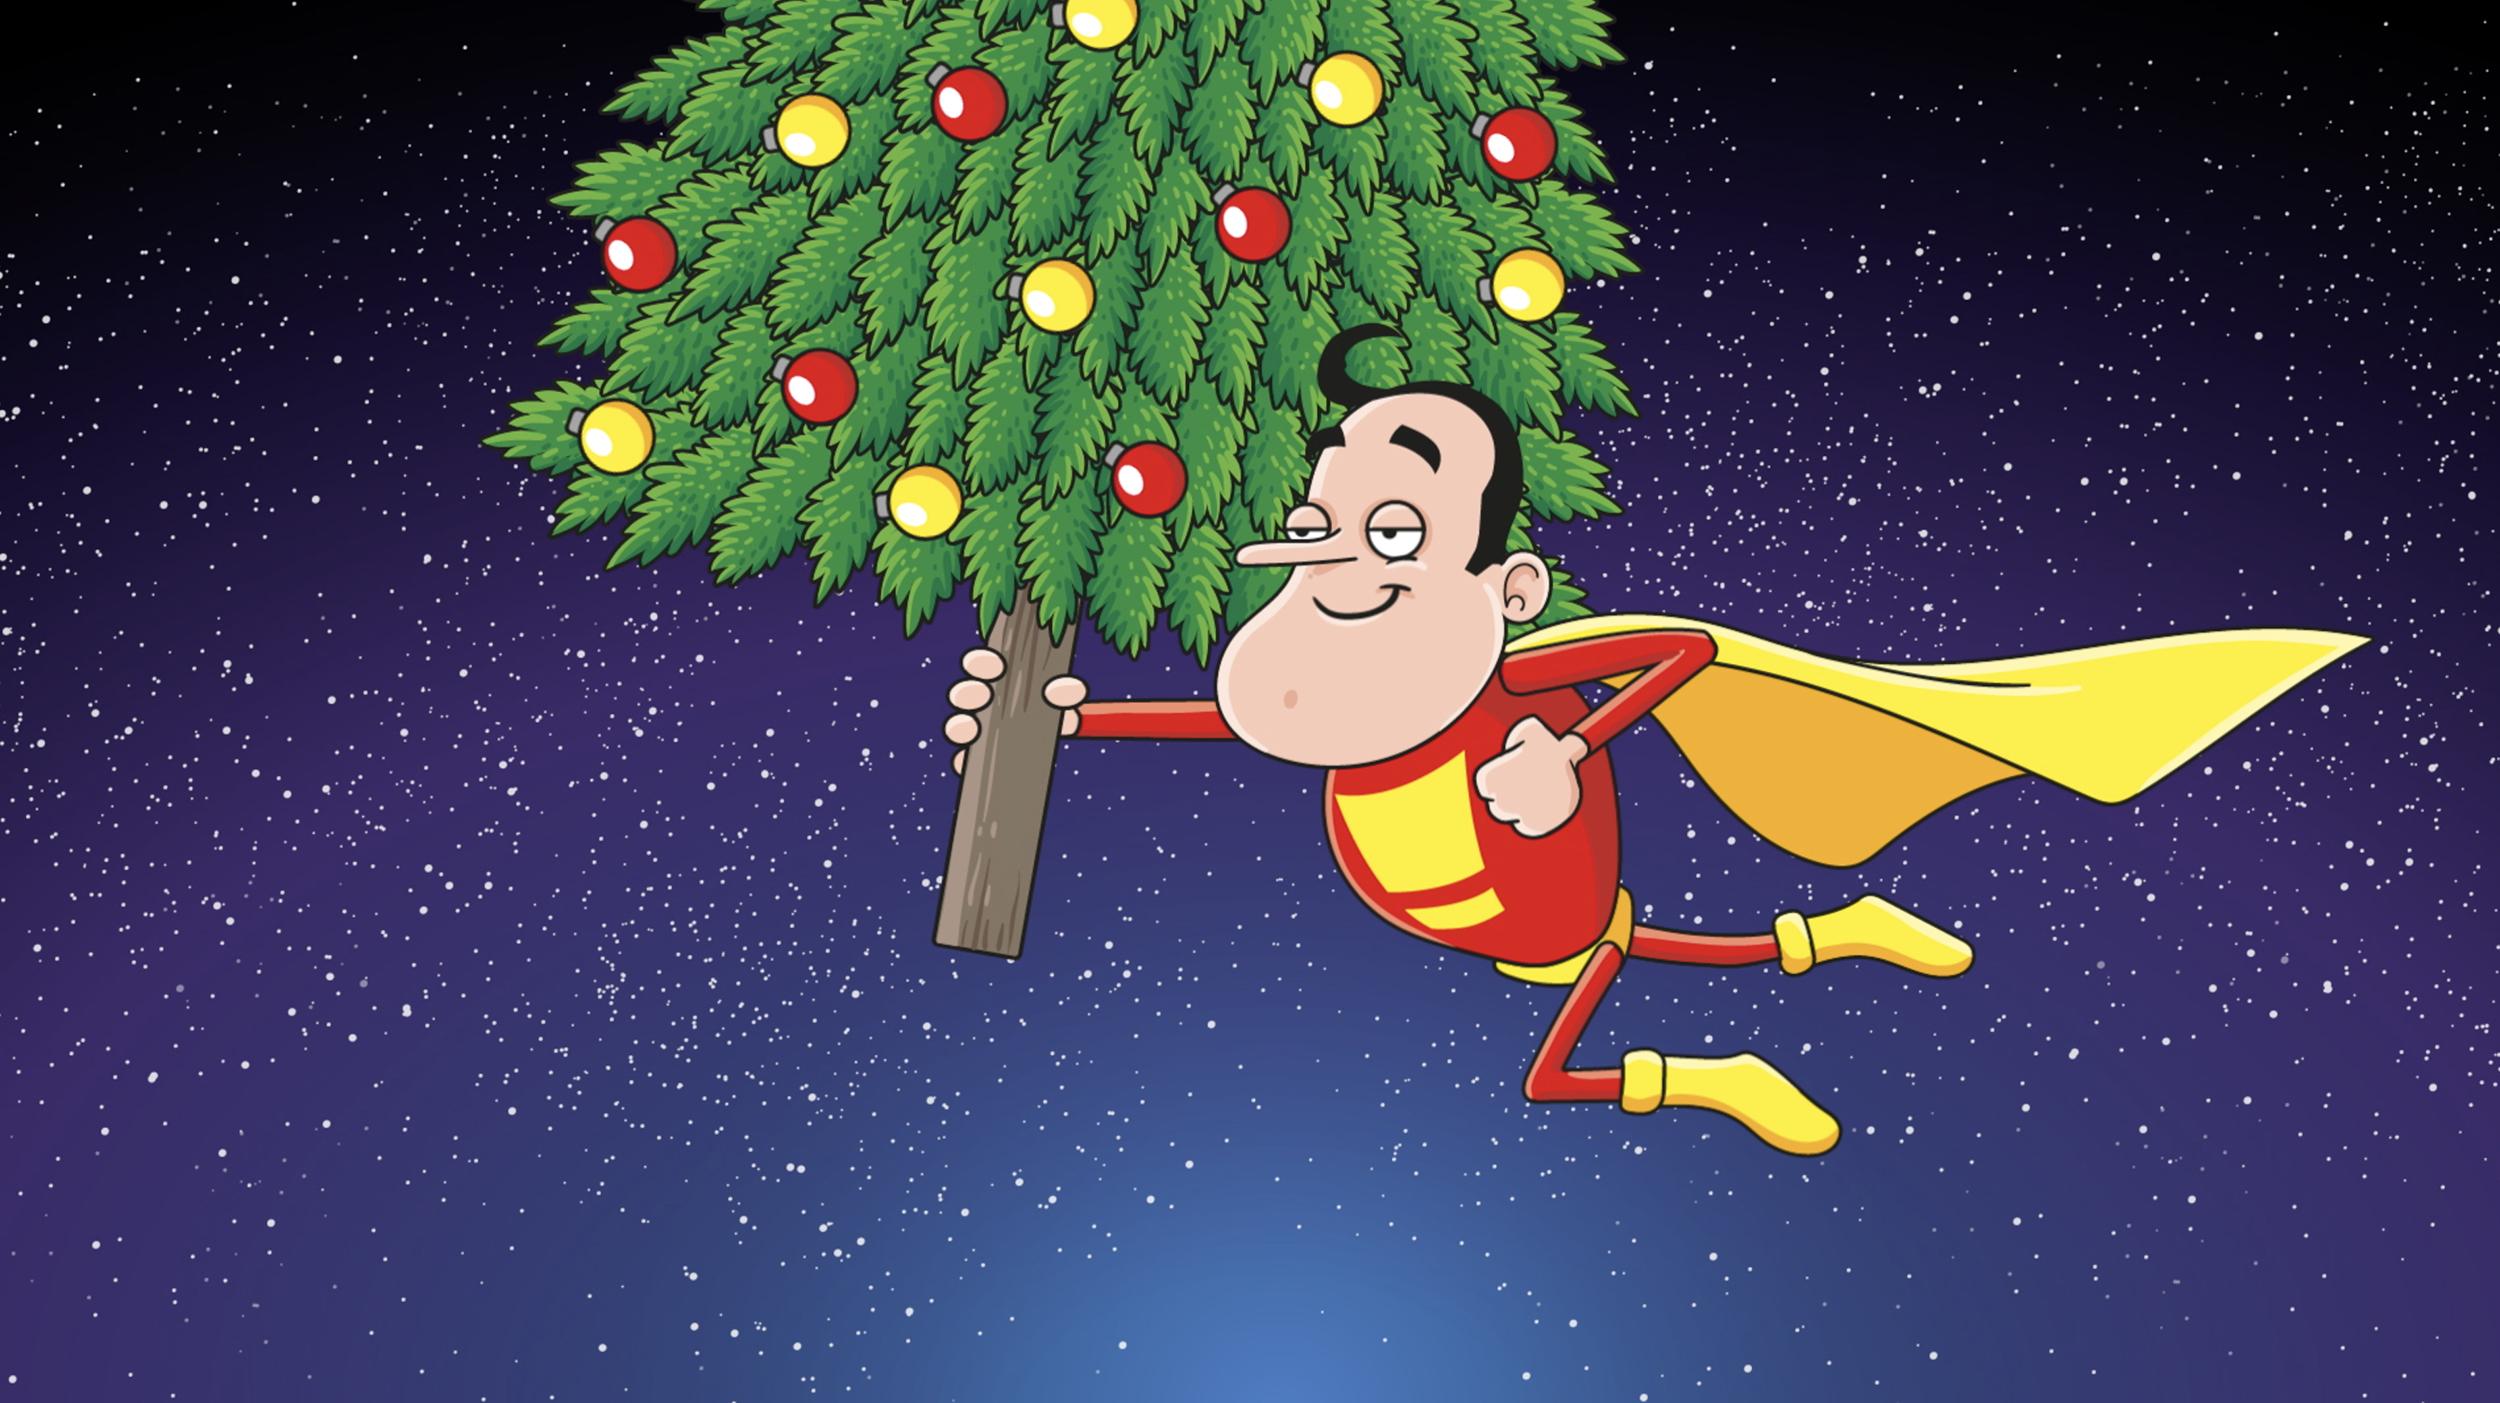 Christmas superhero animation